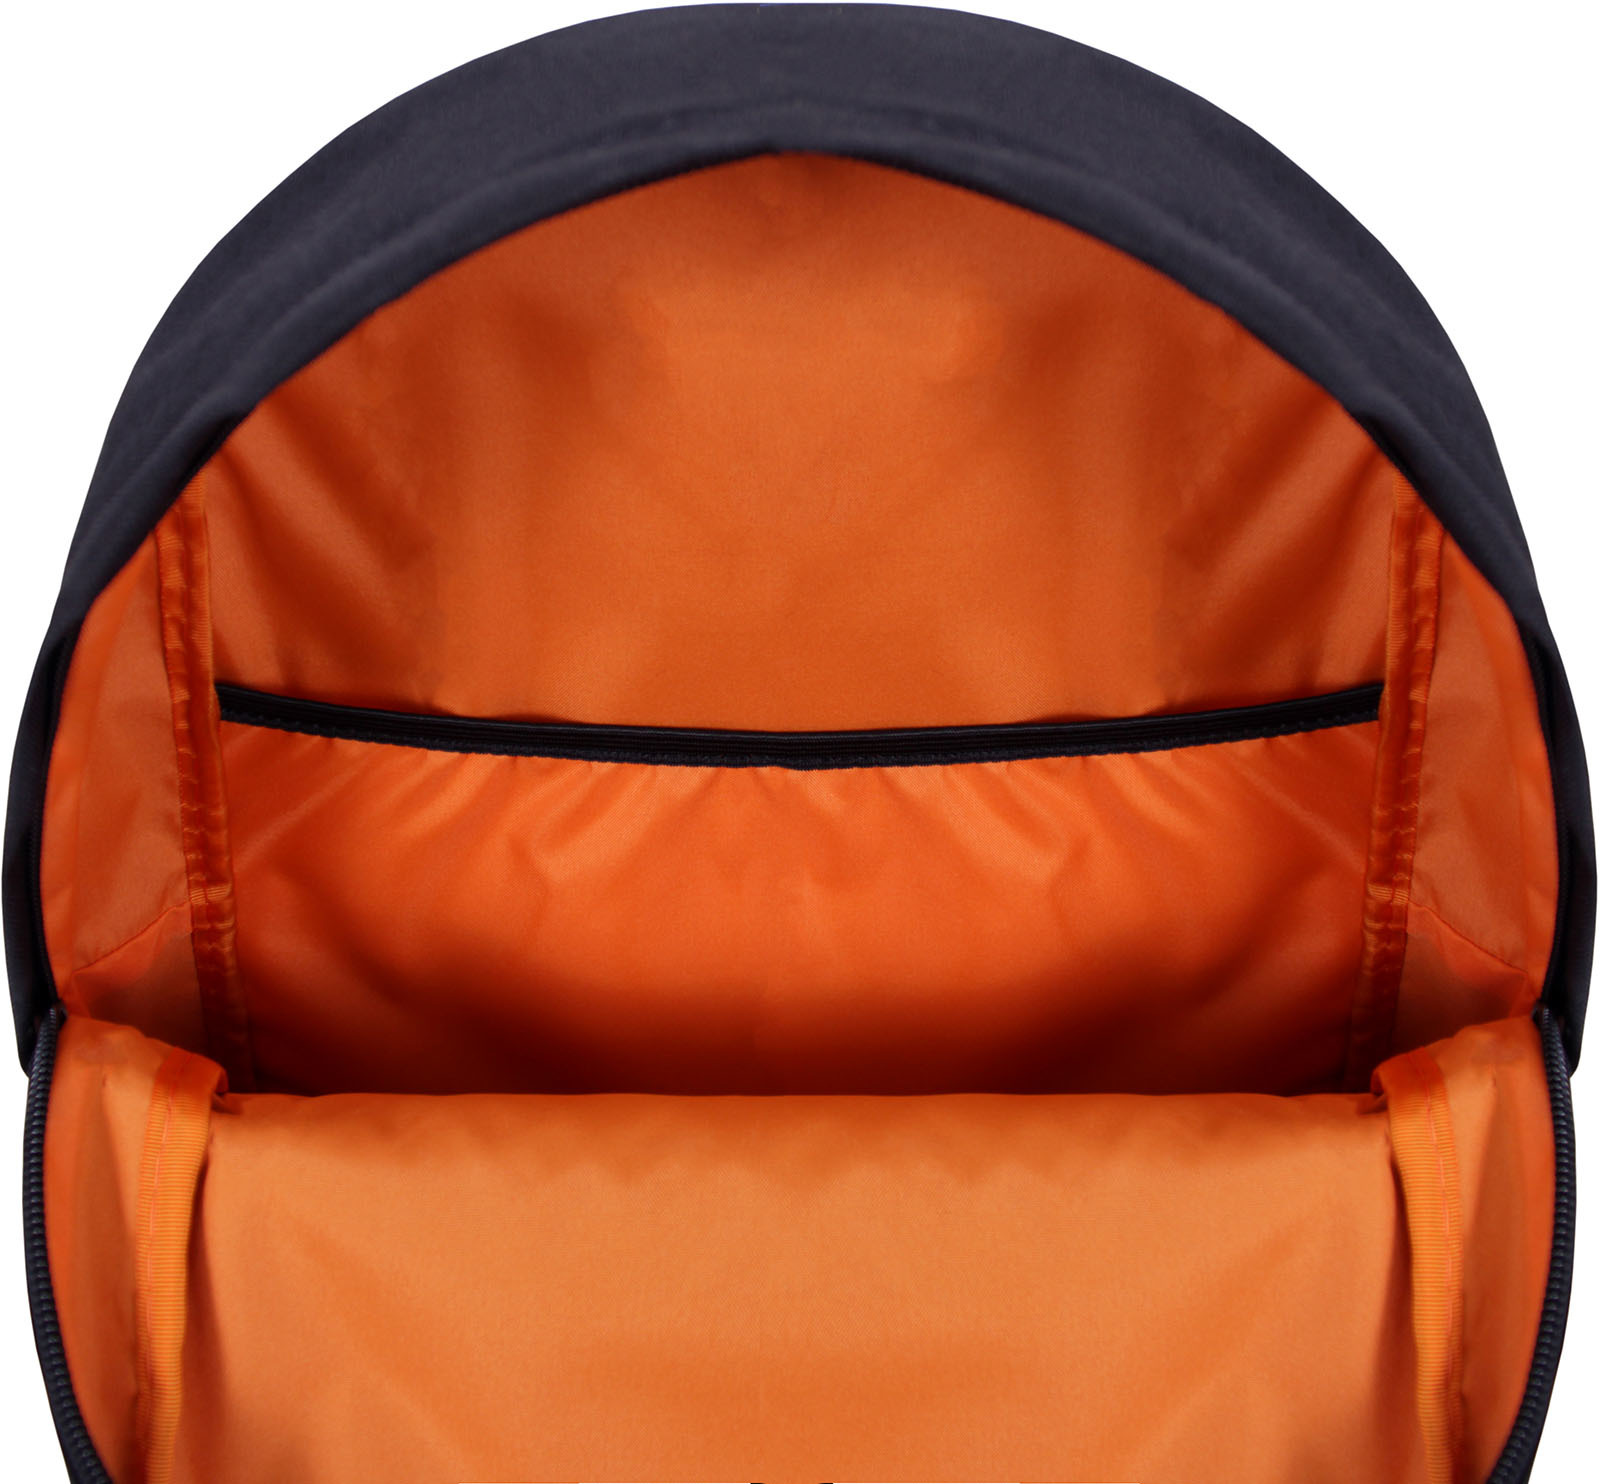 Рюкзак Bagland Молодежный W/R 17 л. чорний 193 (00533662) фото 4